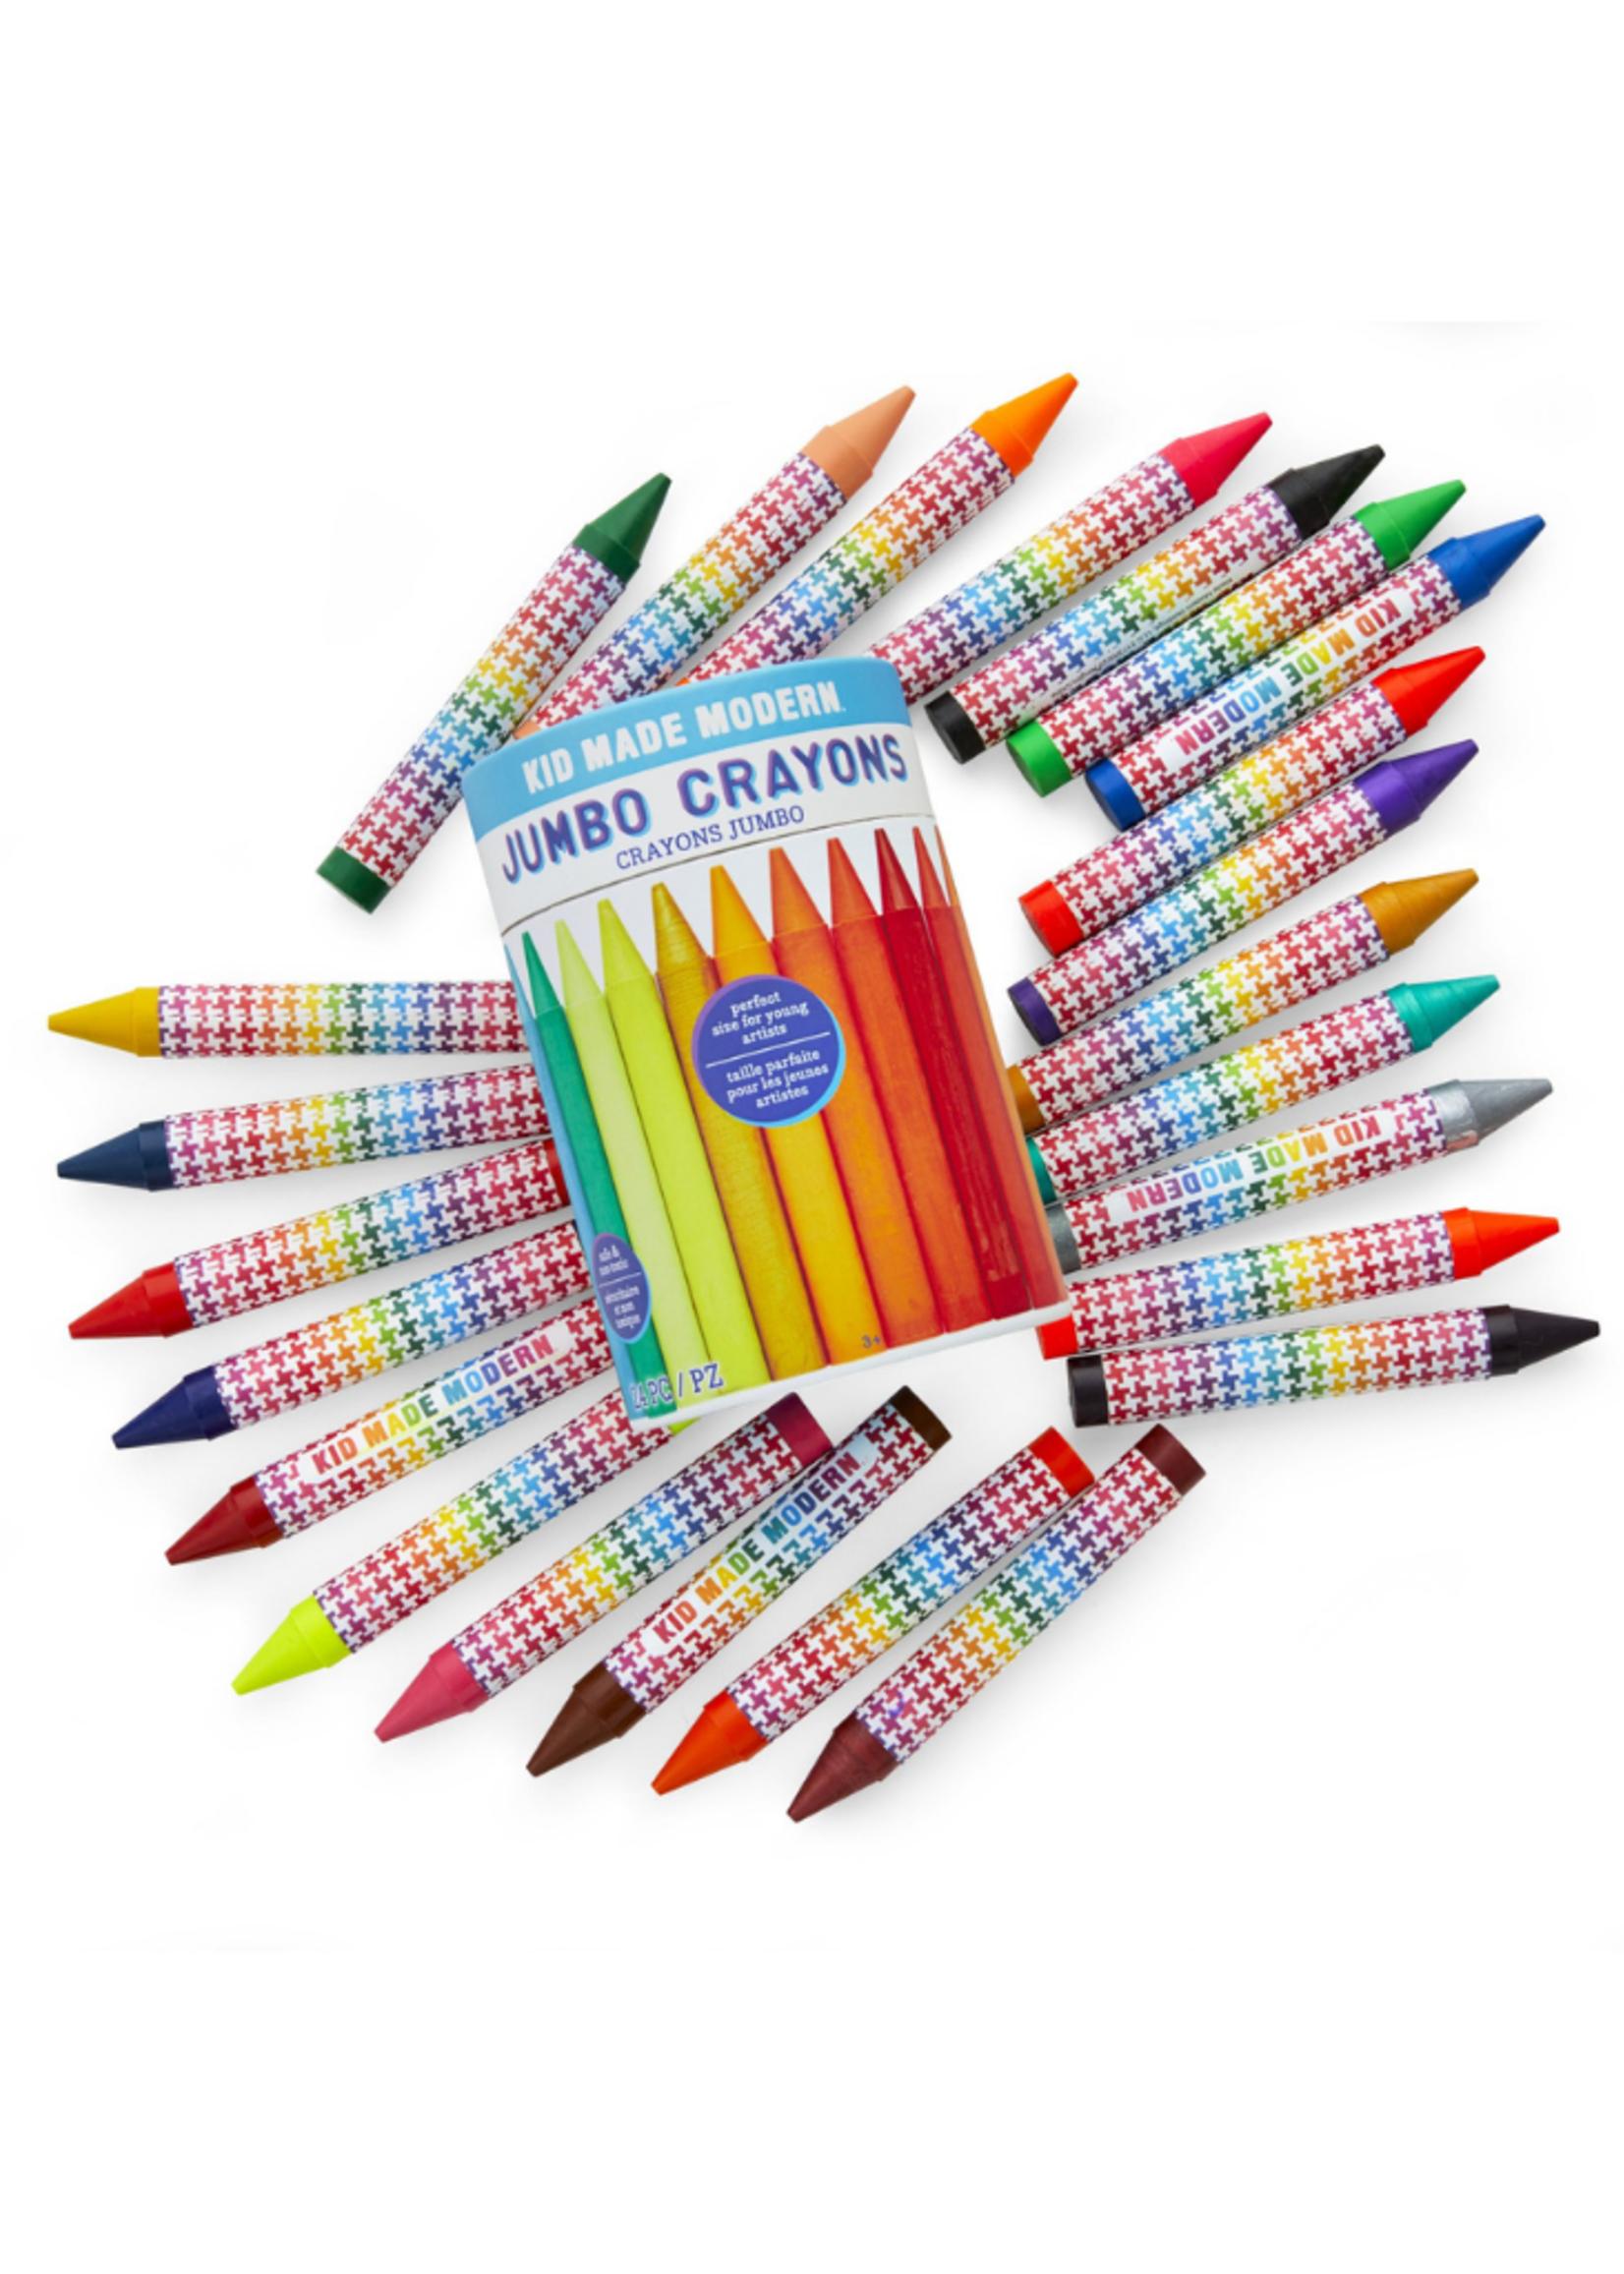 Kids Made Modern Jumbo Crayons